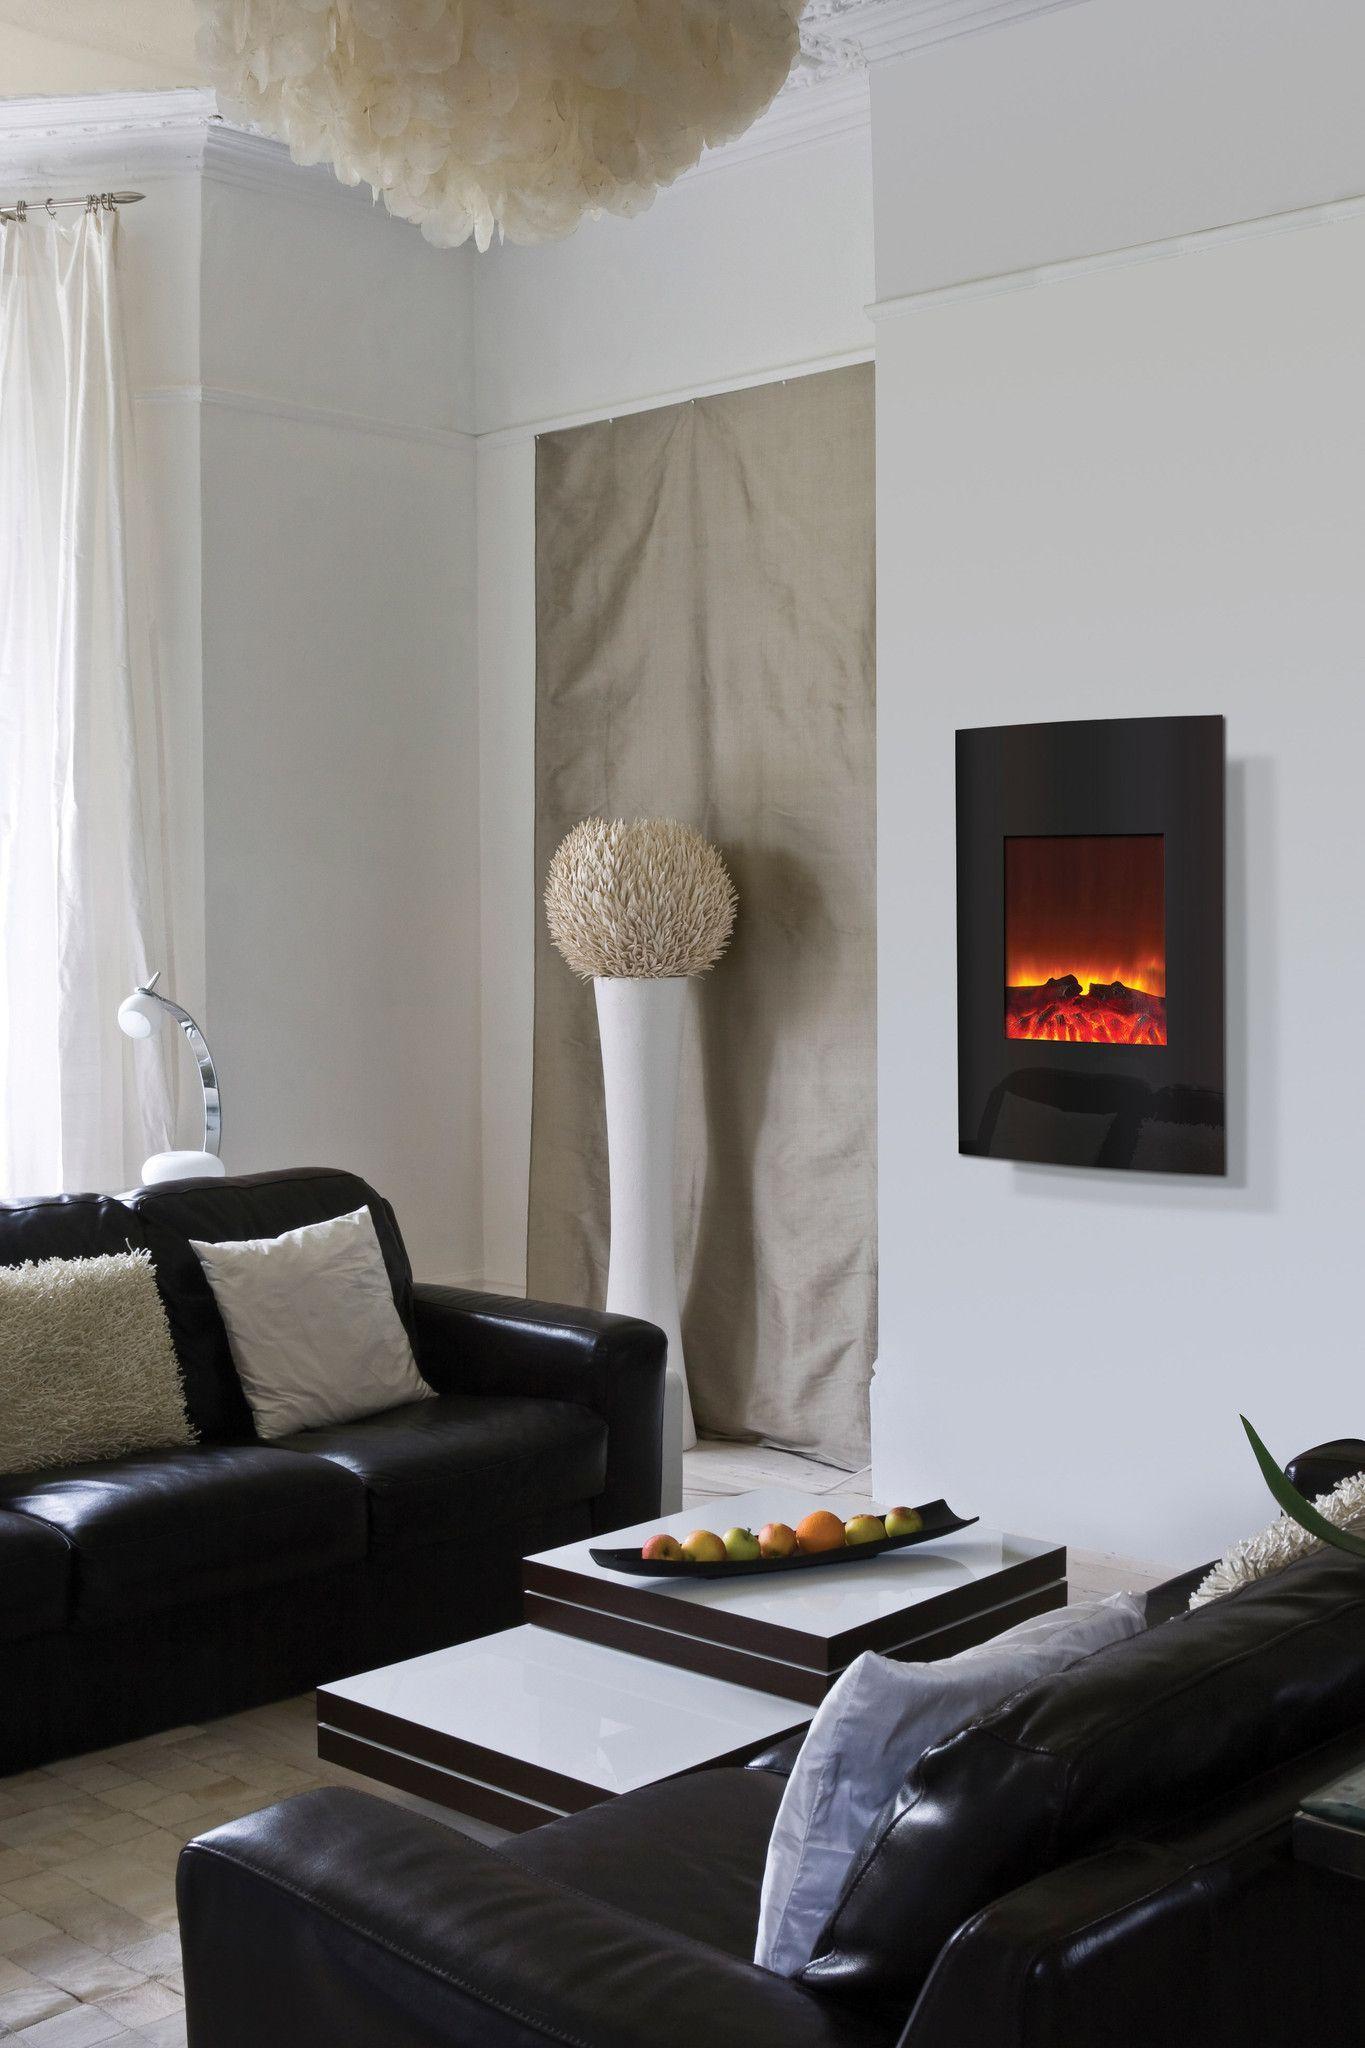 Amantii Wall Mounted Electric Fireplace Wm 2134 Electric Fireplace Fireplace Home